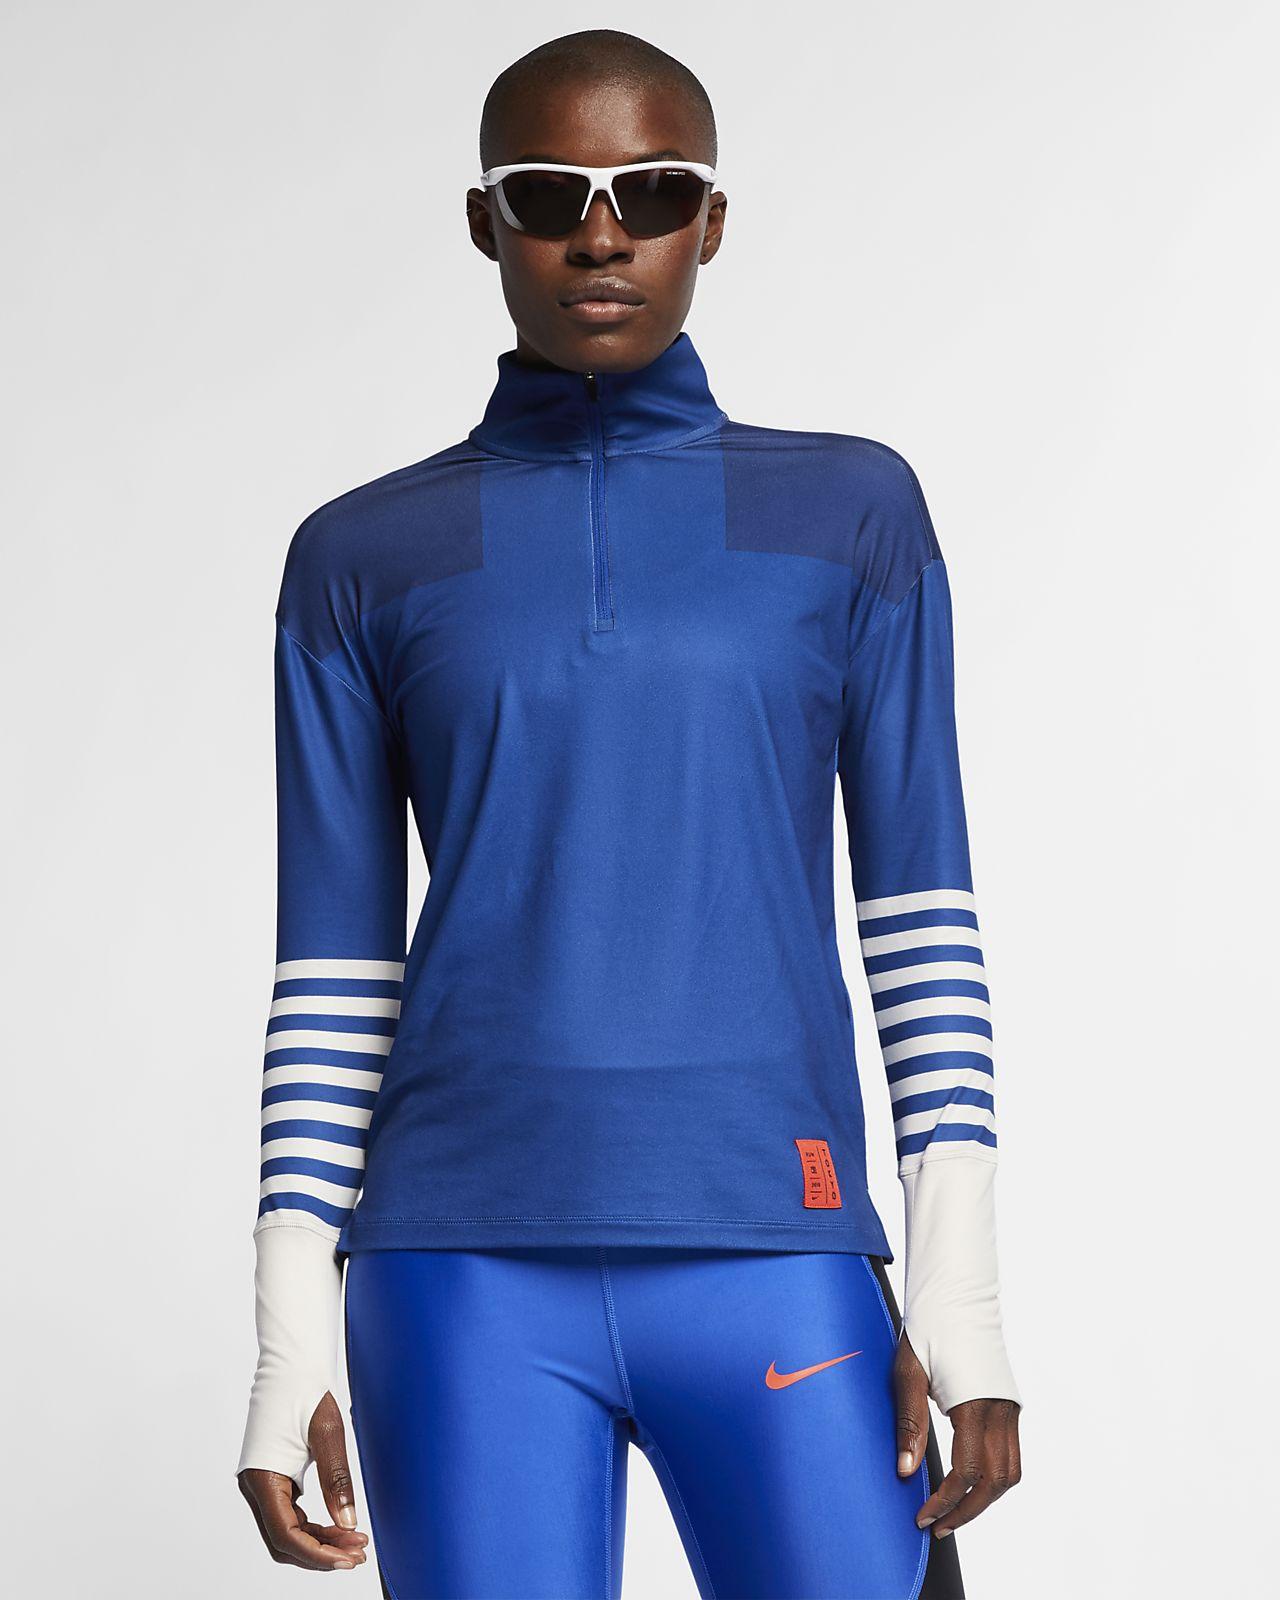 Haut de running à 1/4 de zip Nike pour Femme